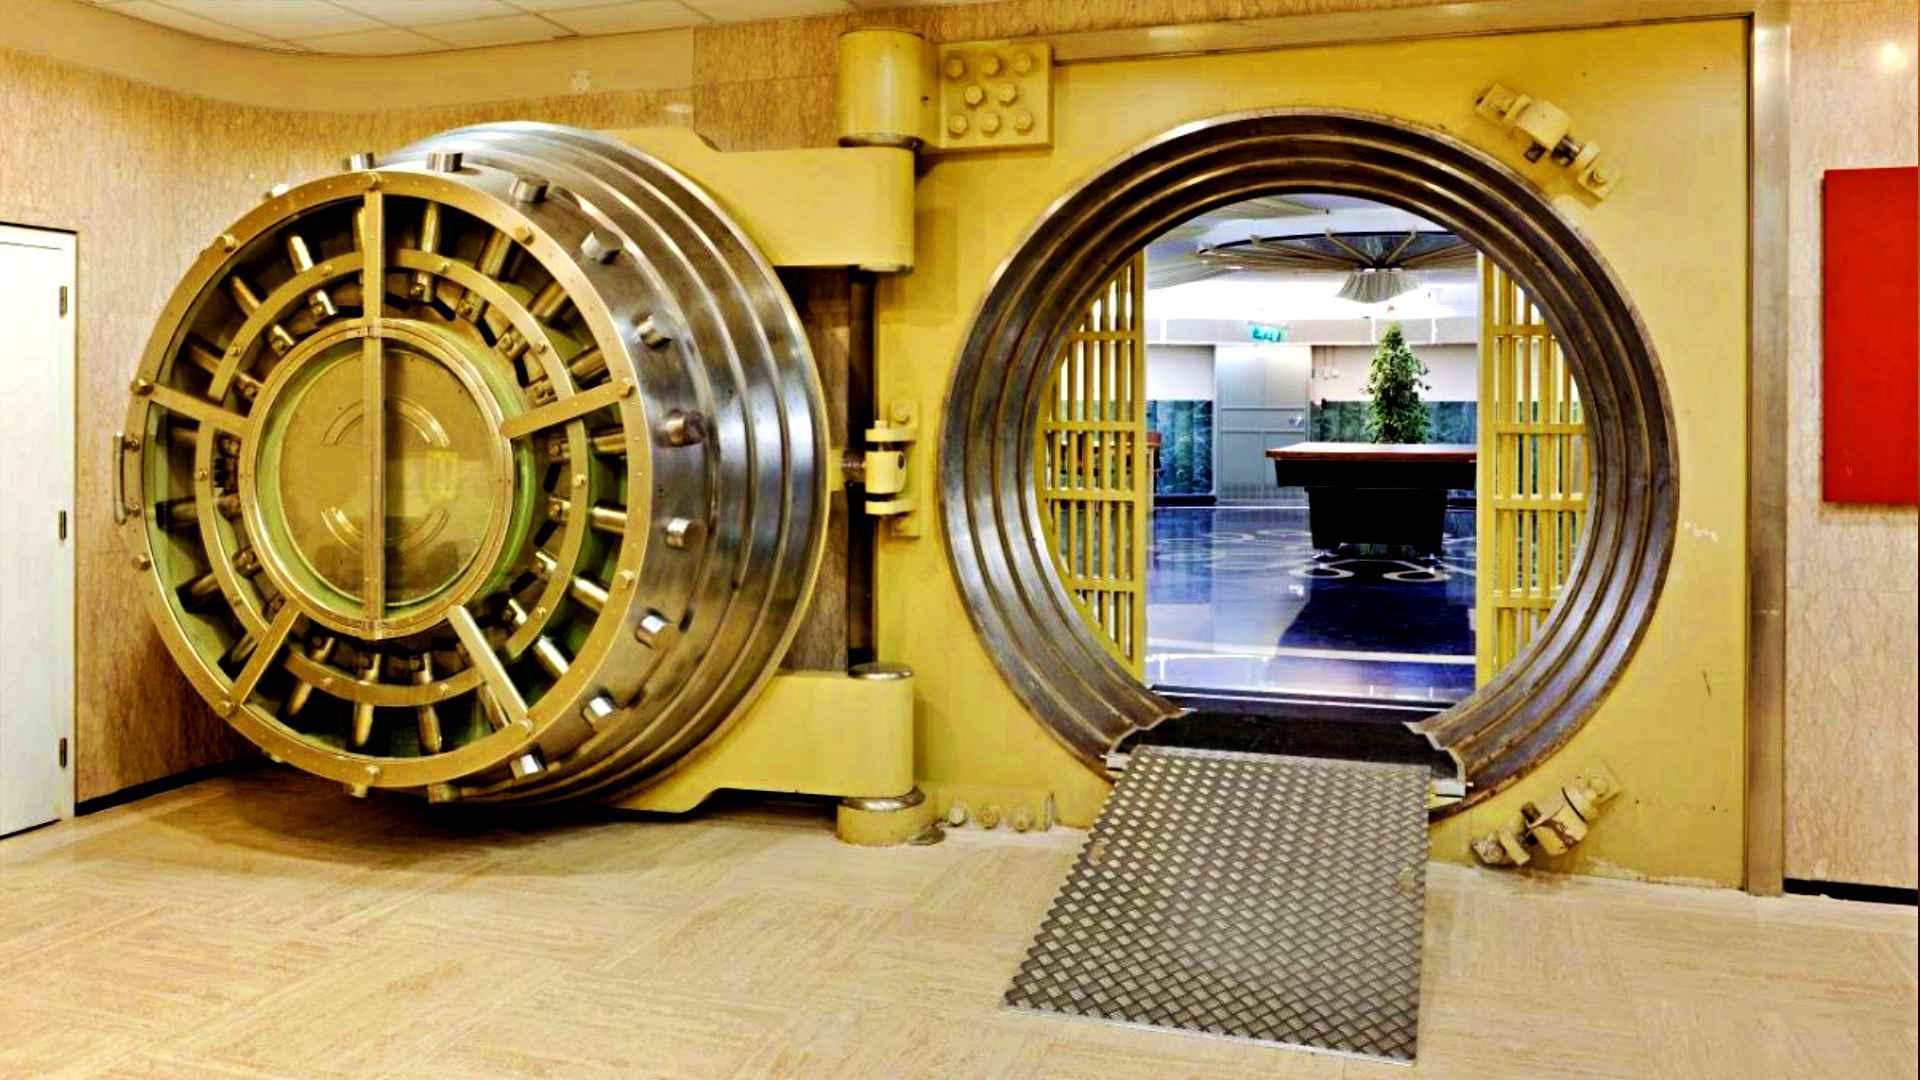 psd2 nyilt bankolas open banking